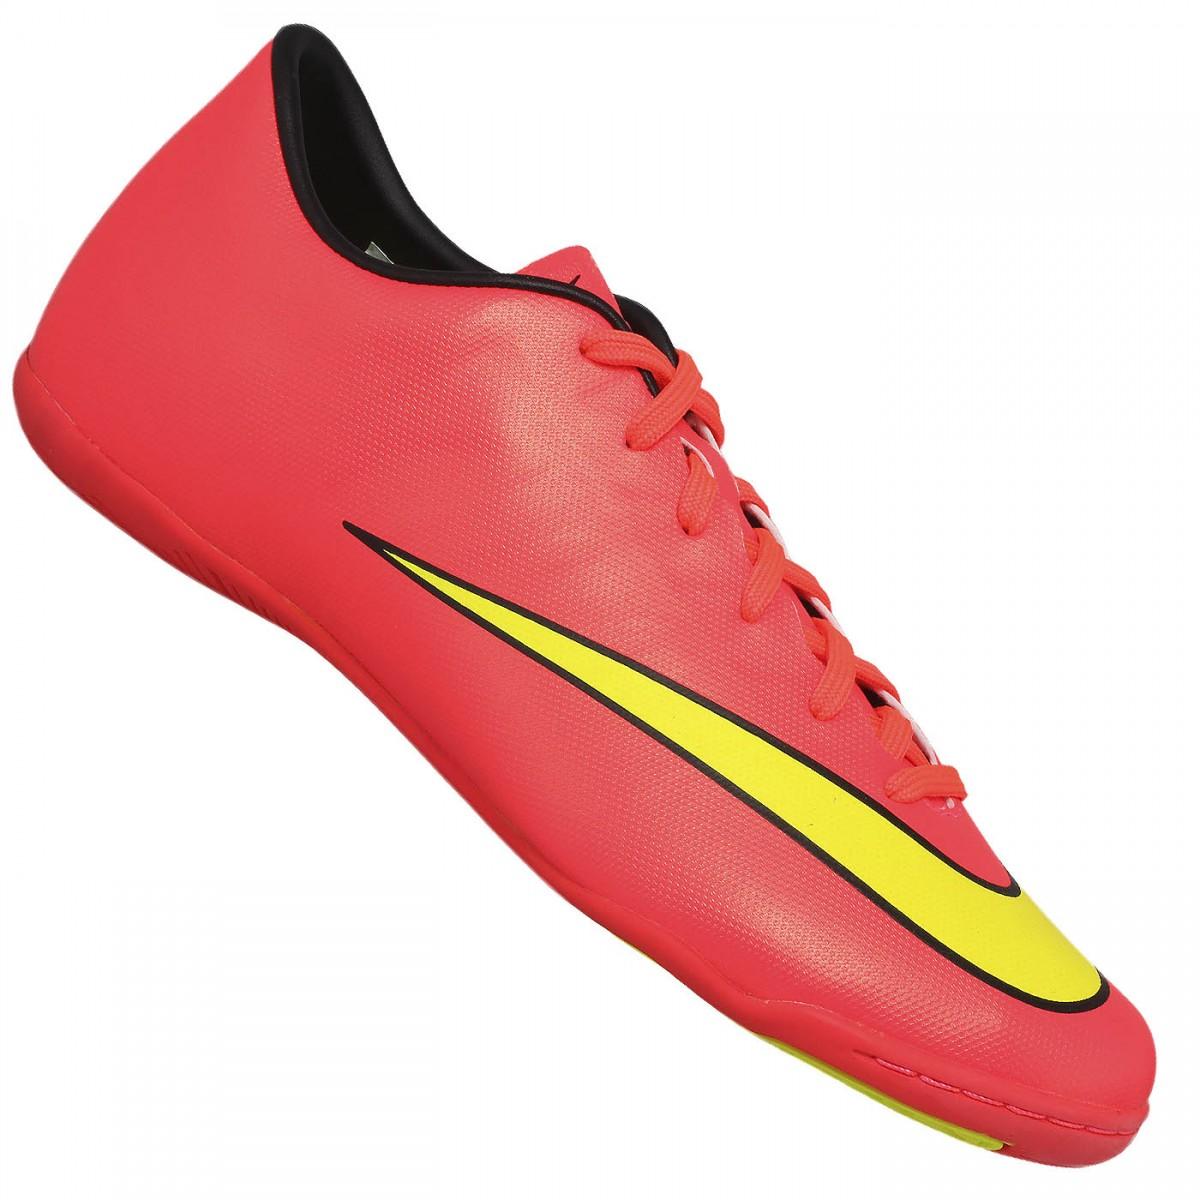 031cfa821de7a Chuteira Nike Mercurial Victory V IC